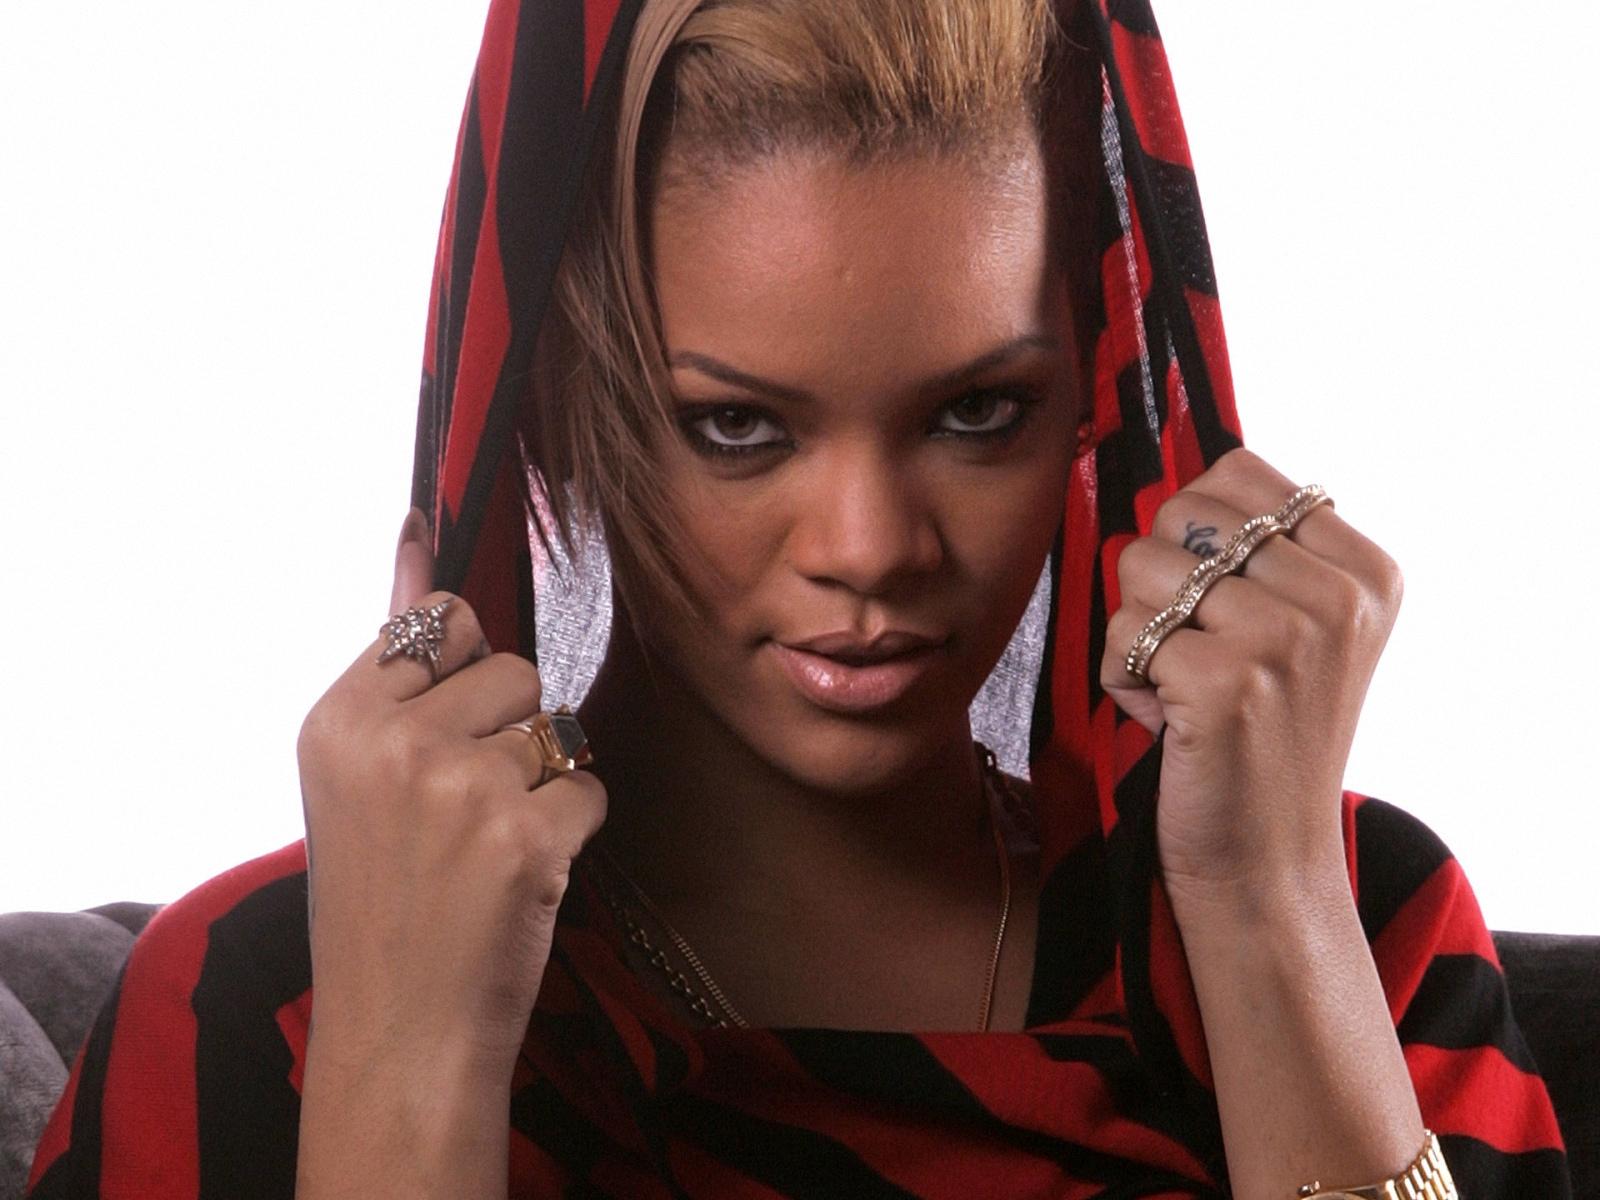 http://2.bp.blogspot.com/-l-NIxSbw-rI/Tyak7jUPOWI/AAAAAAAAC7I/gwoTcebXOBQ/s1600/Rihanna-Sexy-Wallpapers-2.jpg